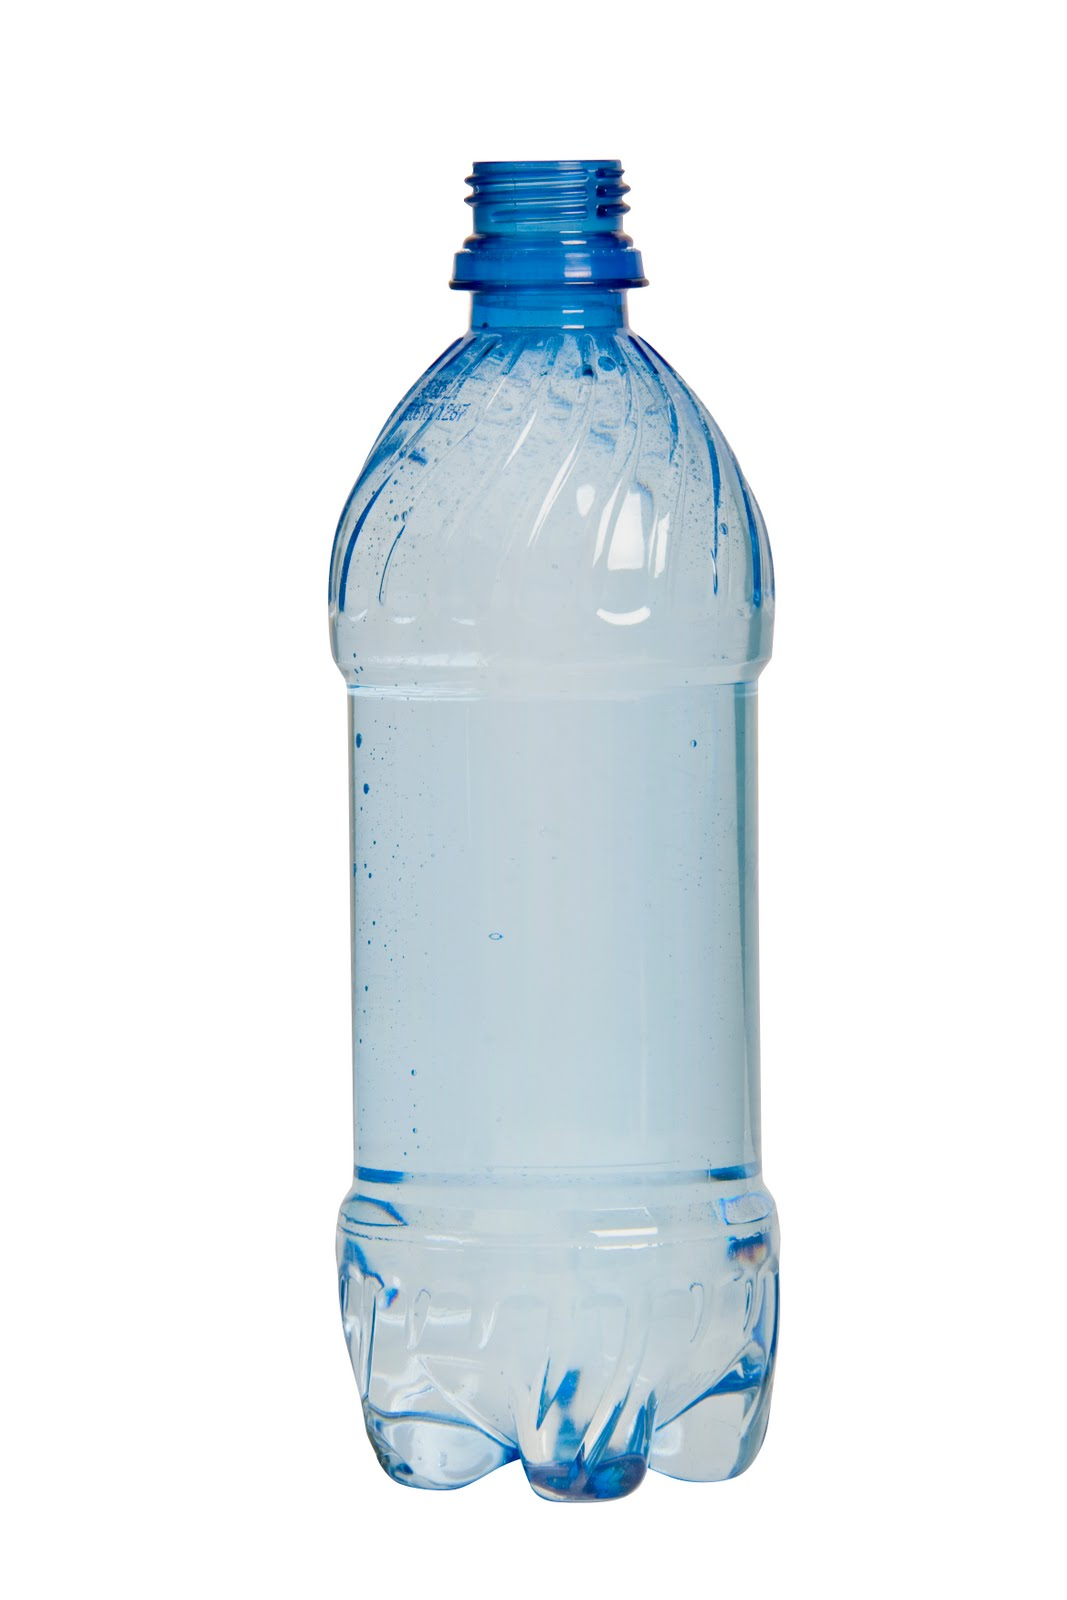 Бутылка с дыркой 9 фотография